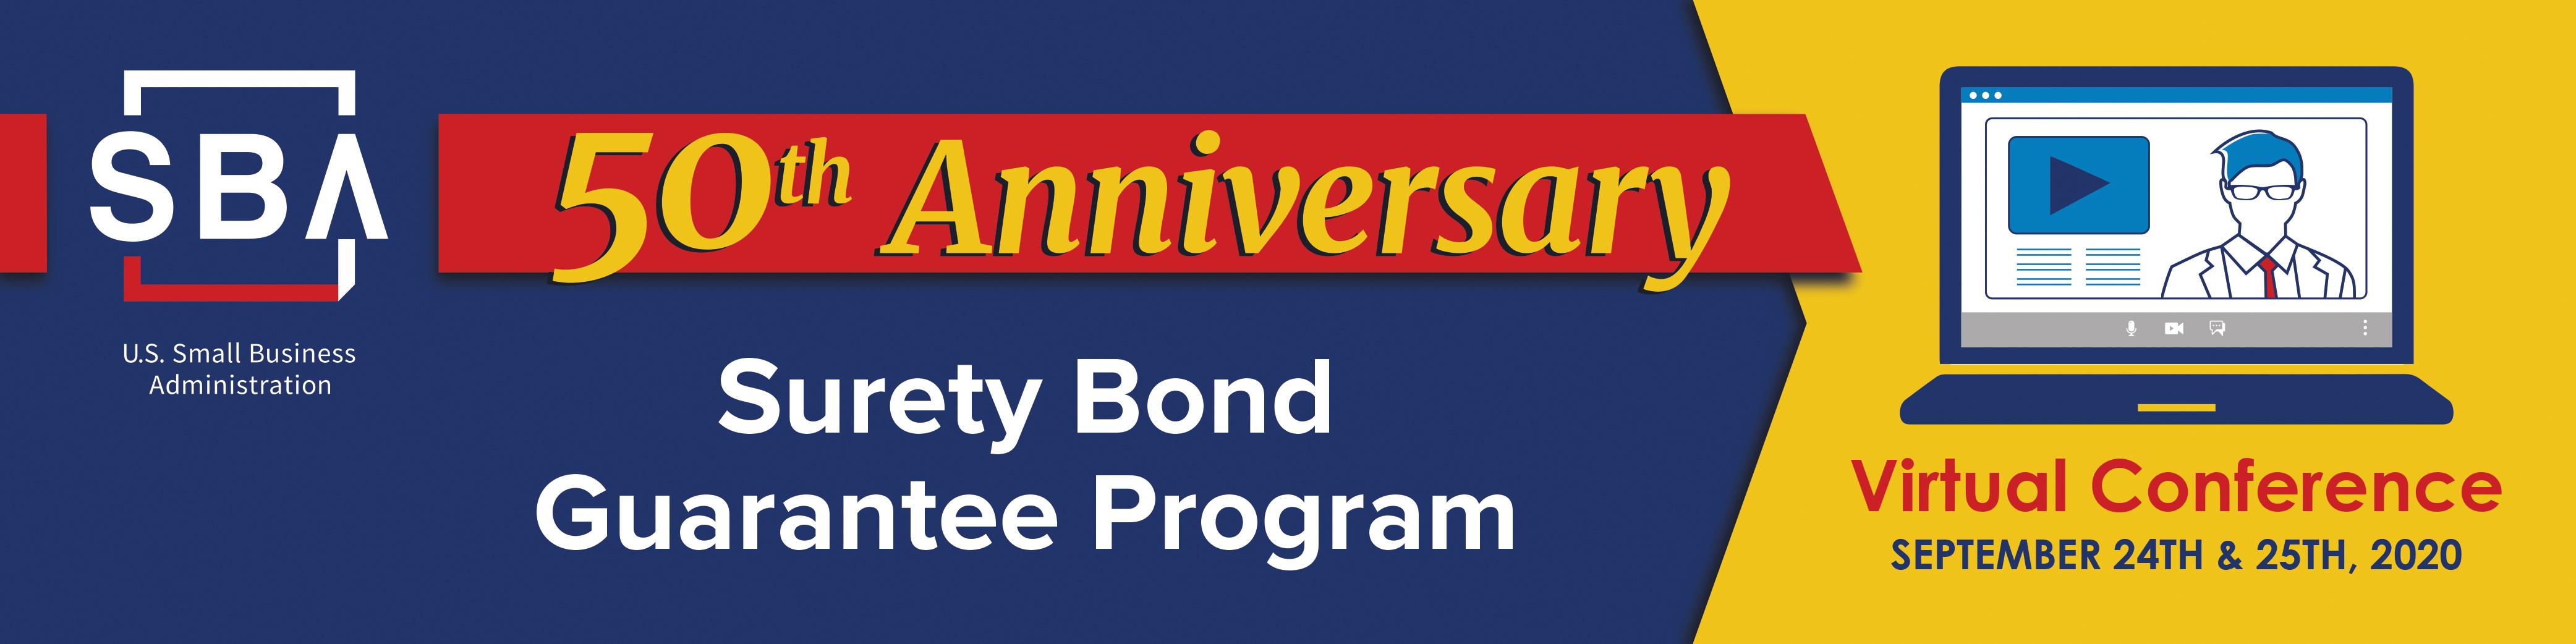 SBA Surety 50th Anniversary Event